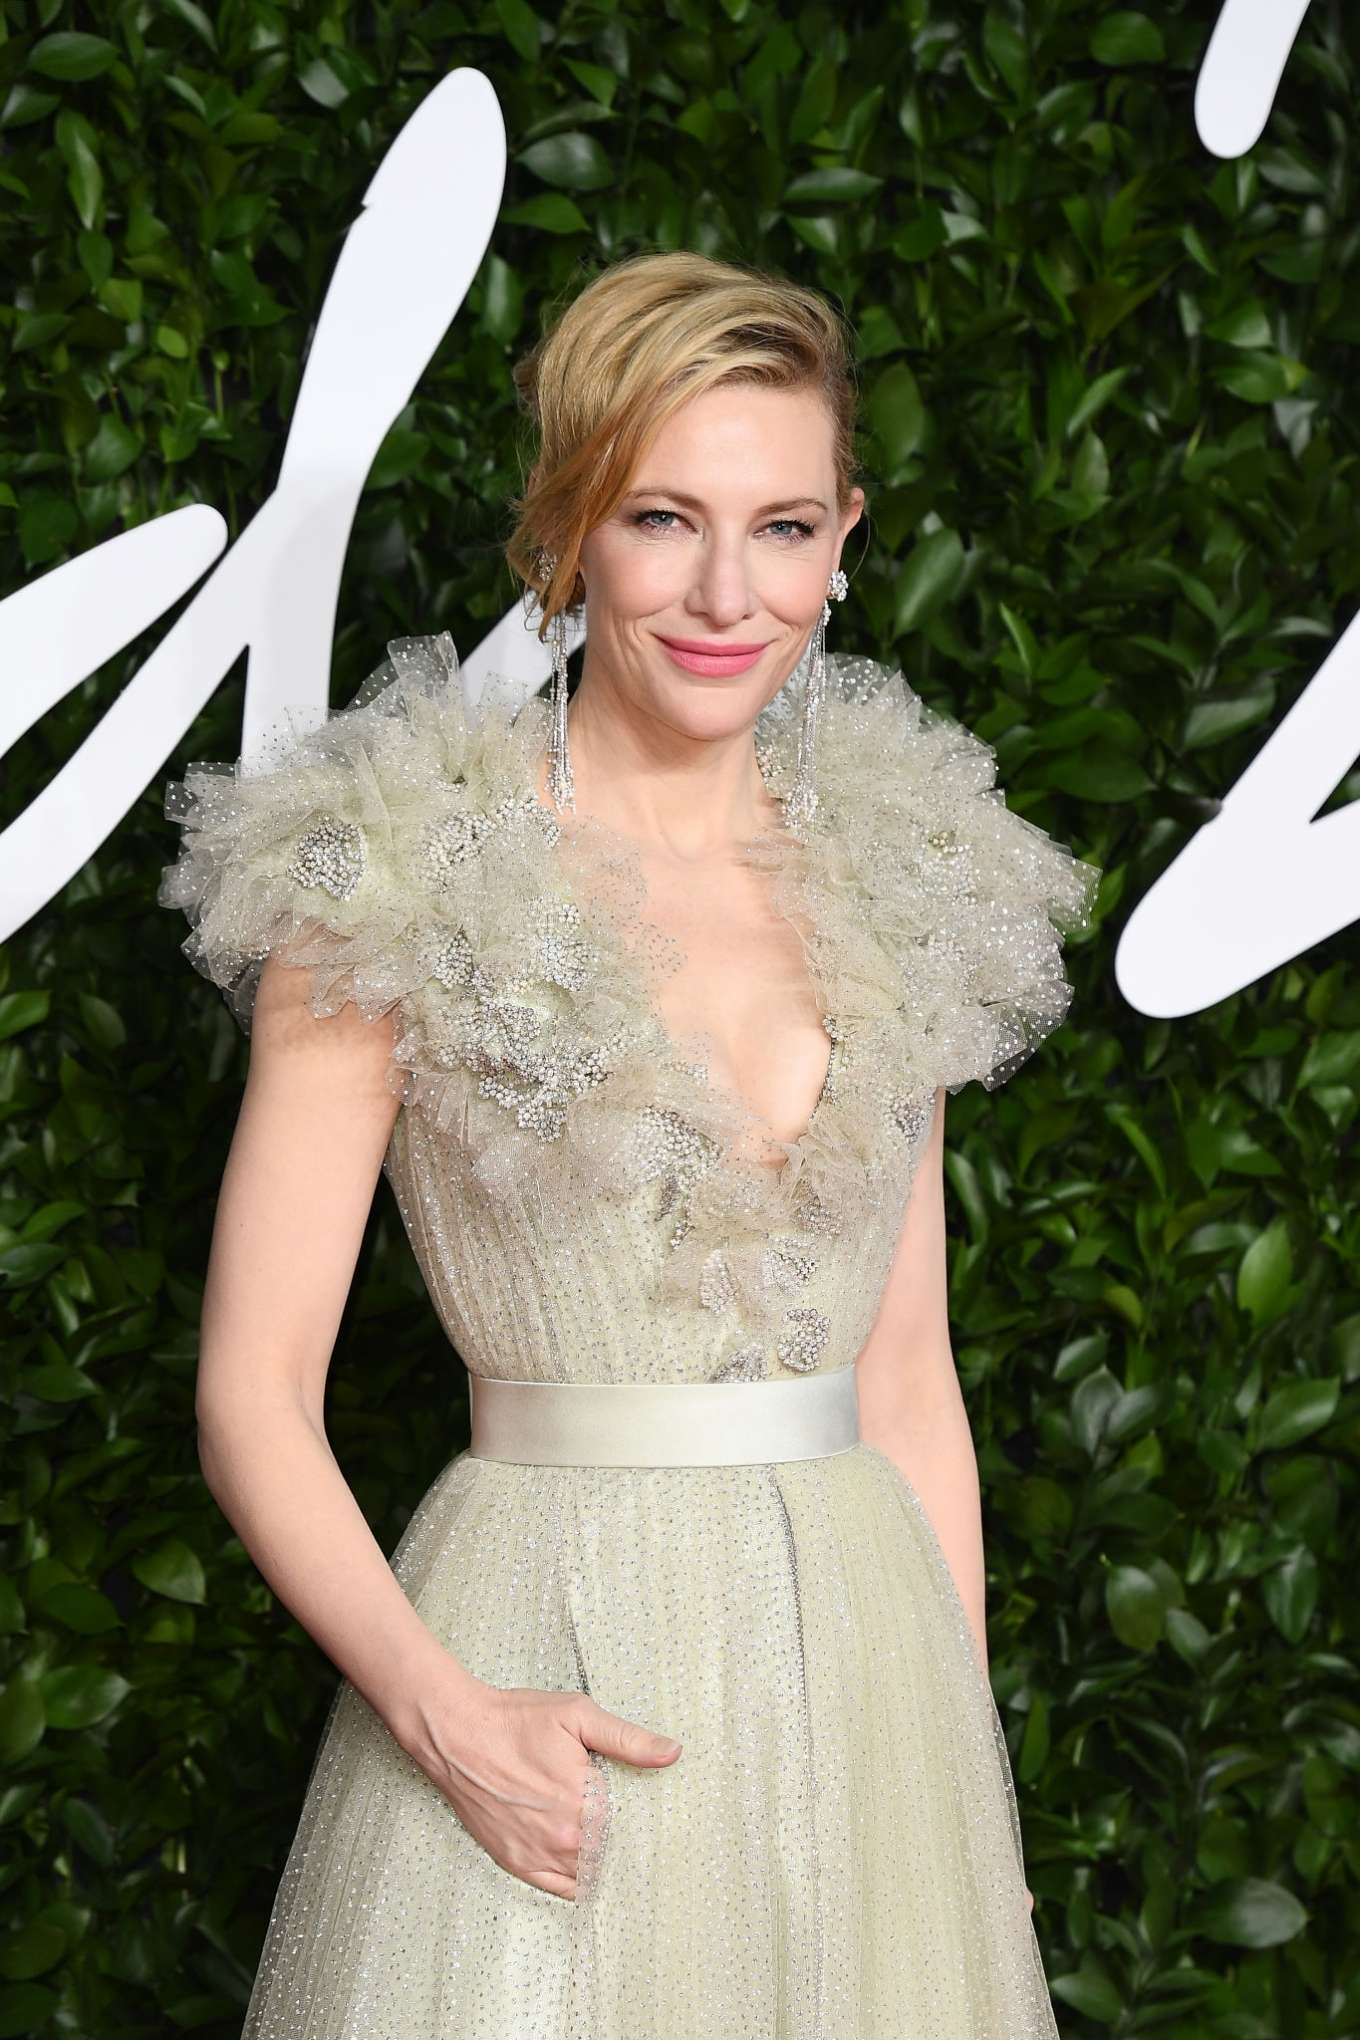 Cate Blanchett 2019 : Cate Blanchett – Fashion Awards 2019 in London-05